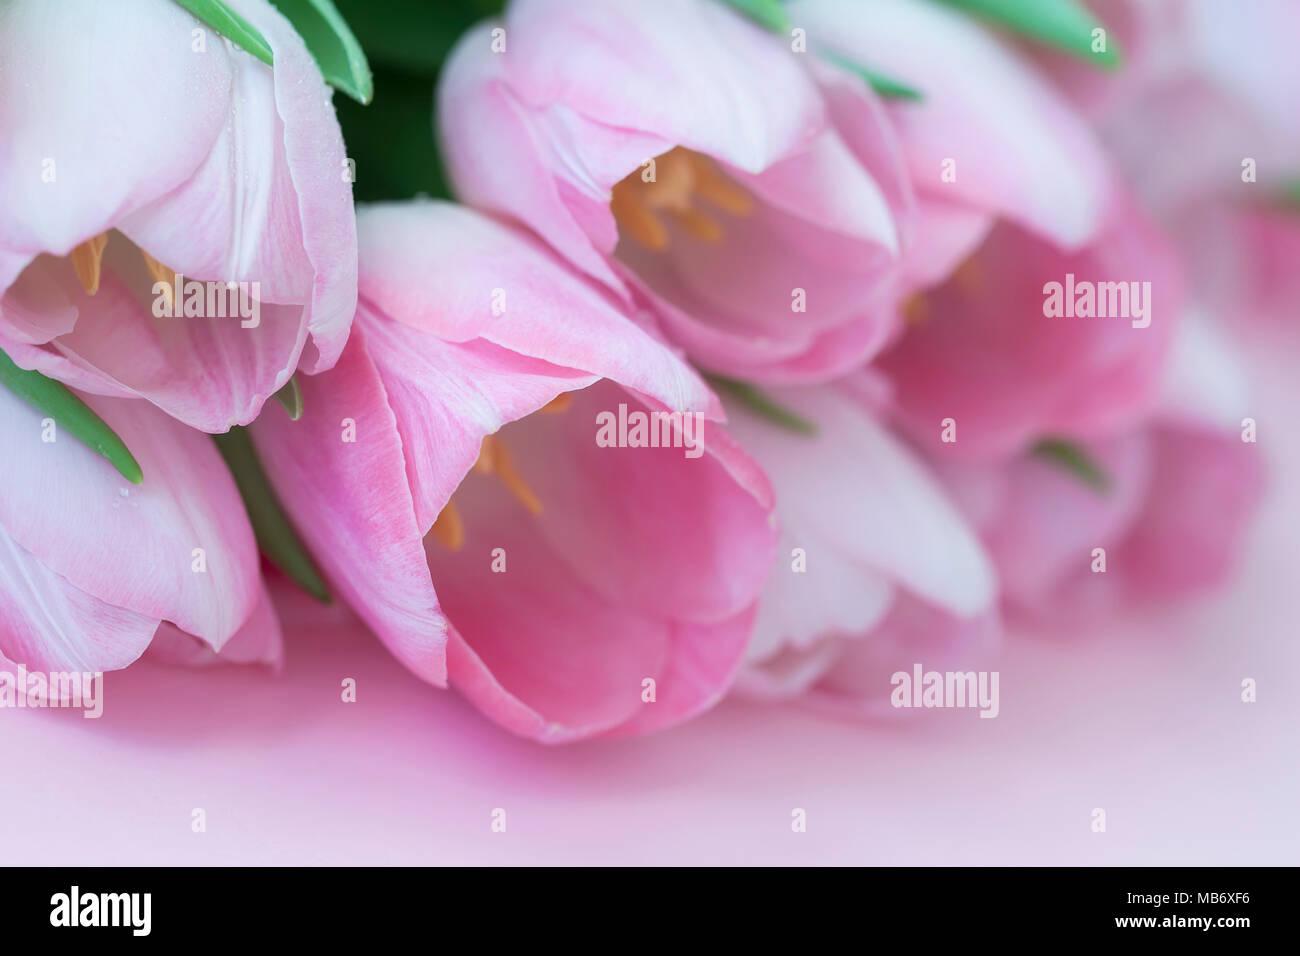 Light Pink Tender Background Tulips Soft Spring Romantic Floral